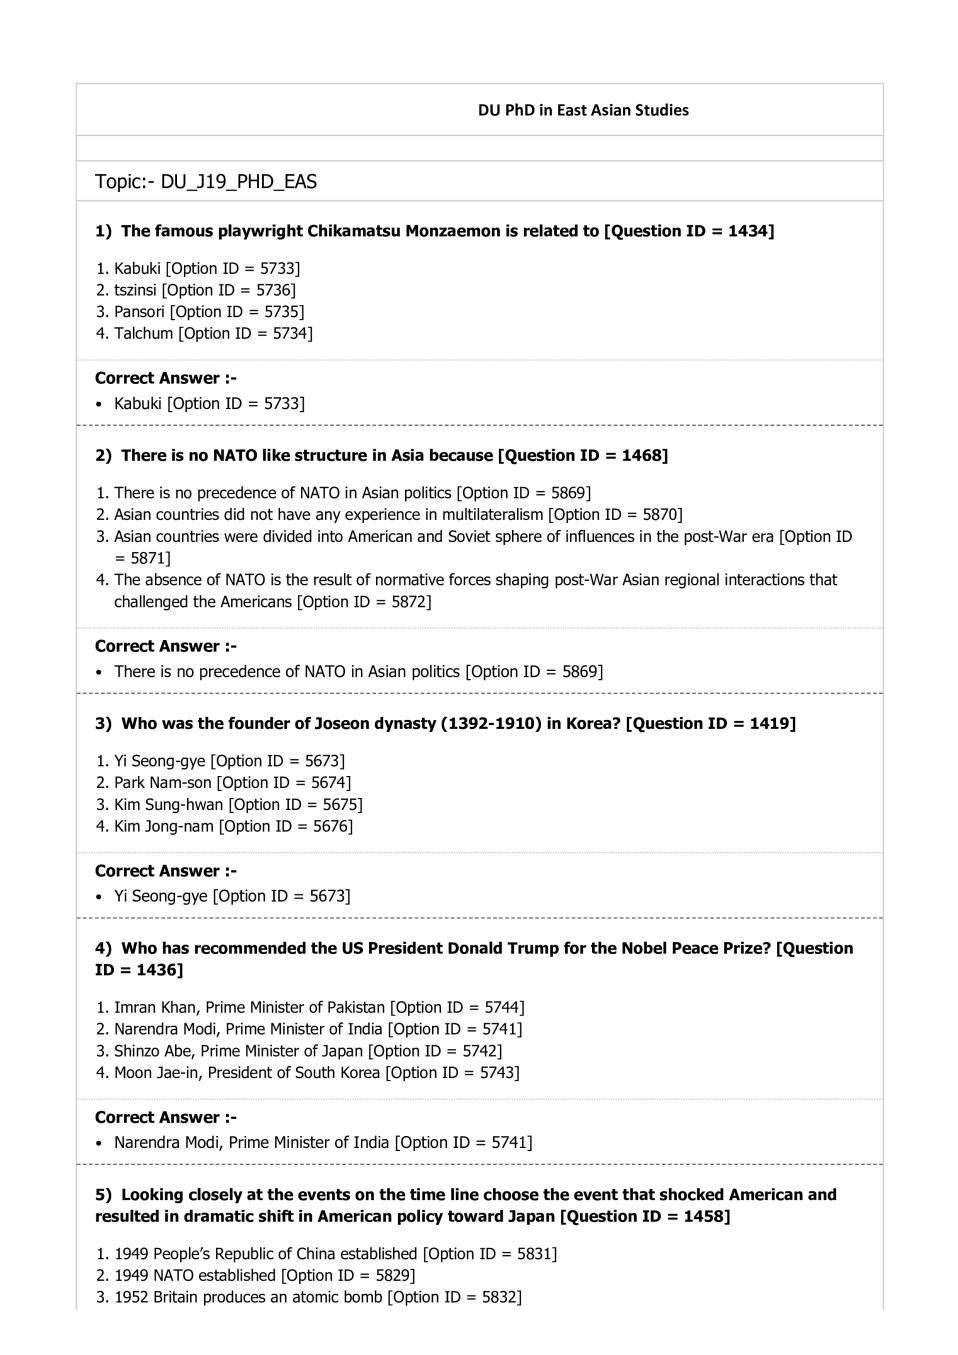 DUET Question Paper 2019 for Ph.D East Asian Studies - Page 1